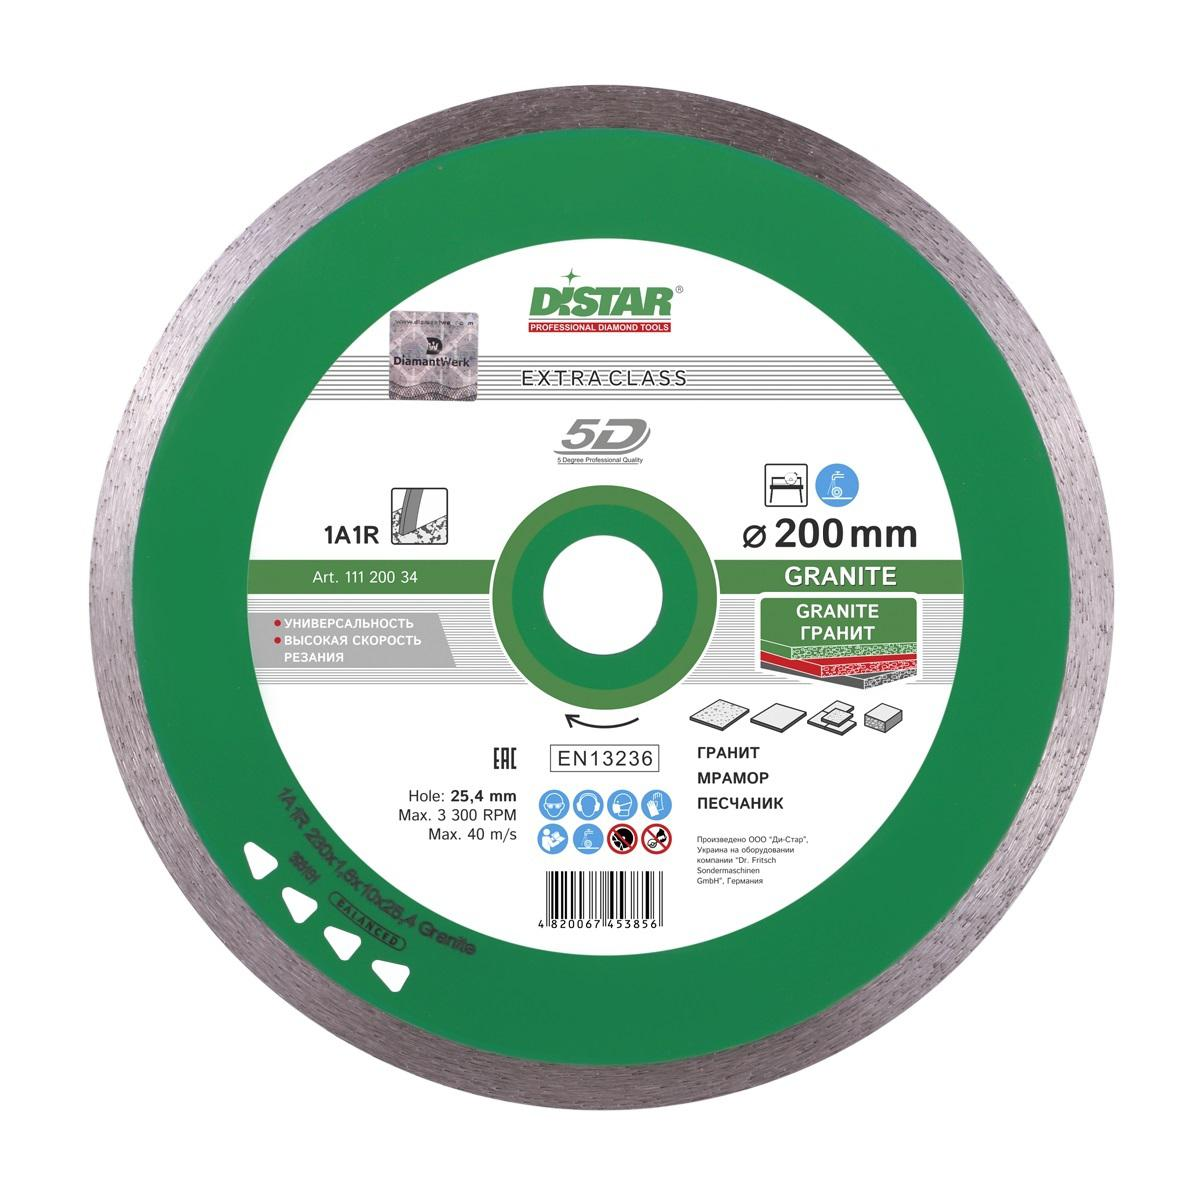 Купить Круг алмазный Di-star 1a1r granite laser rp(rs)35t 249625 200 Х 25.4